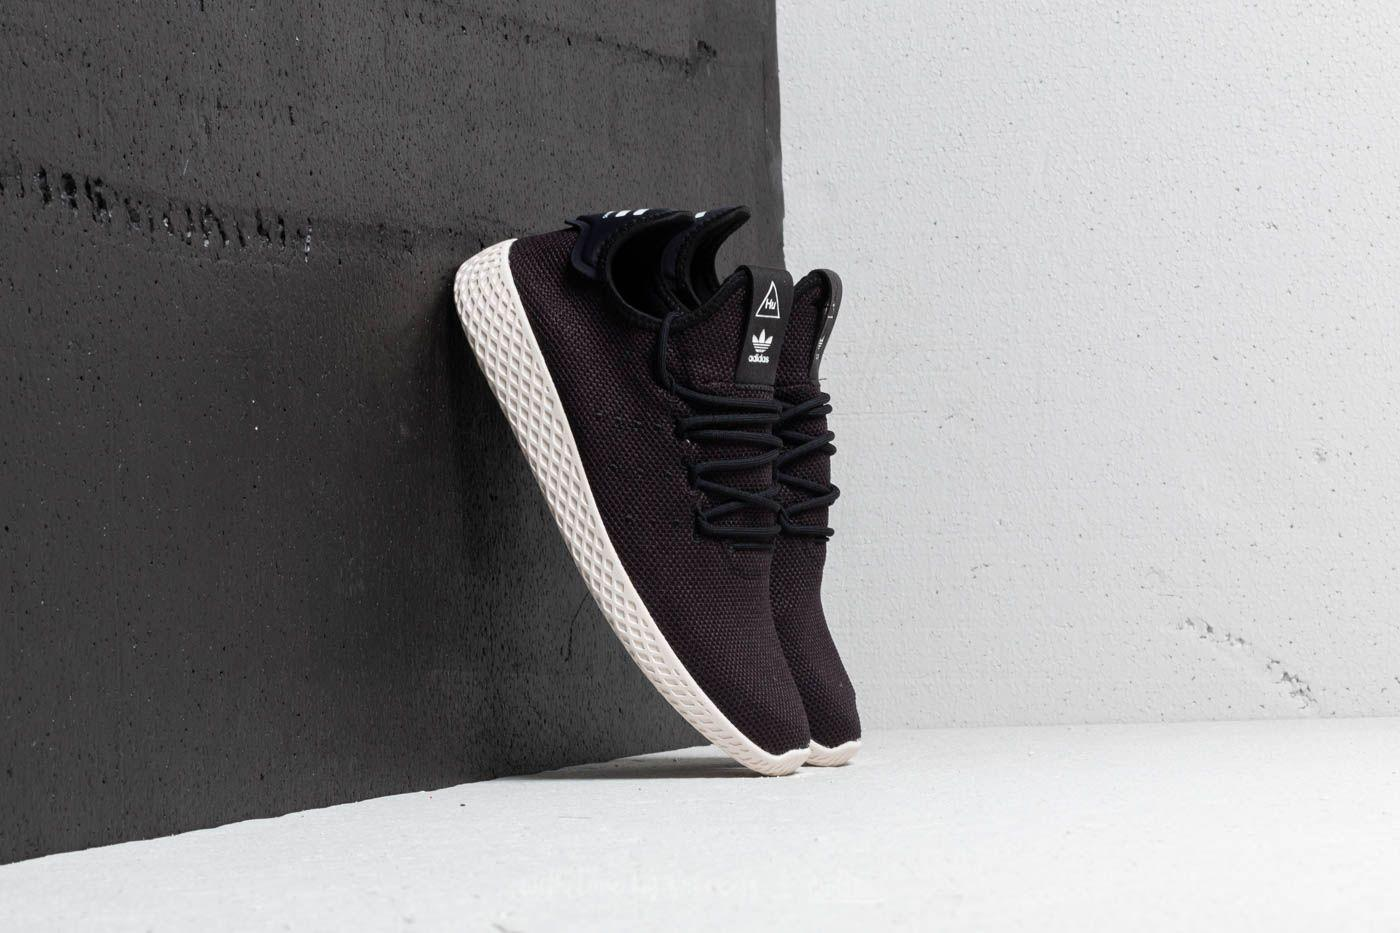 Lyst - adidas Originals Adidas Pw Tennis Hu Core Black  Core Black ... c1e2d3ed1